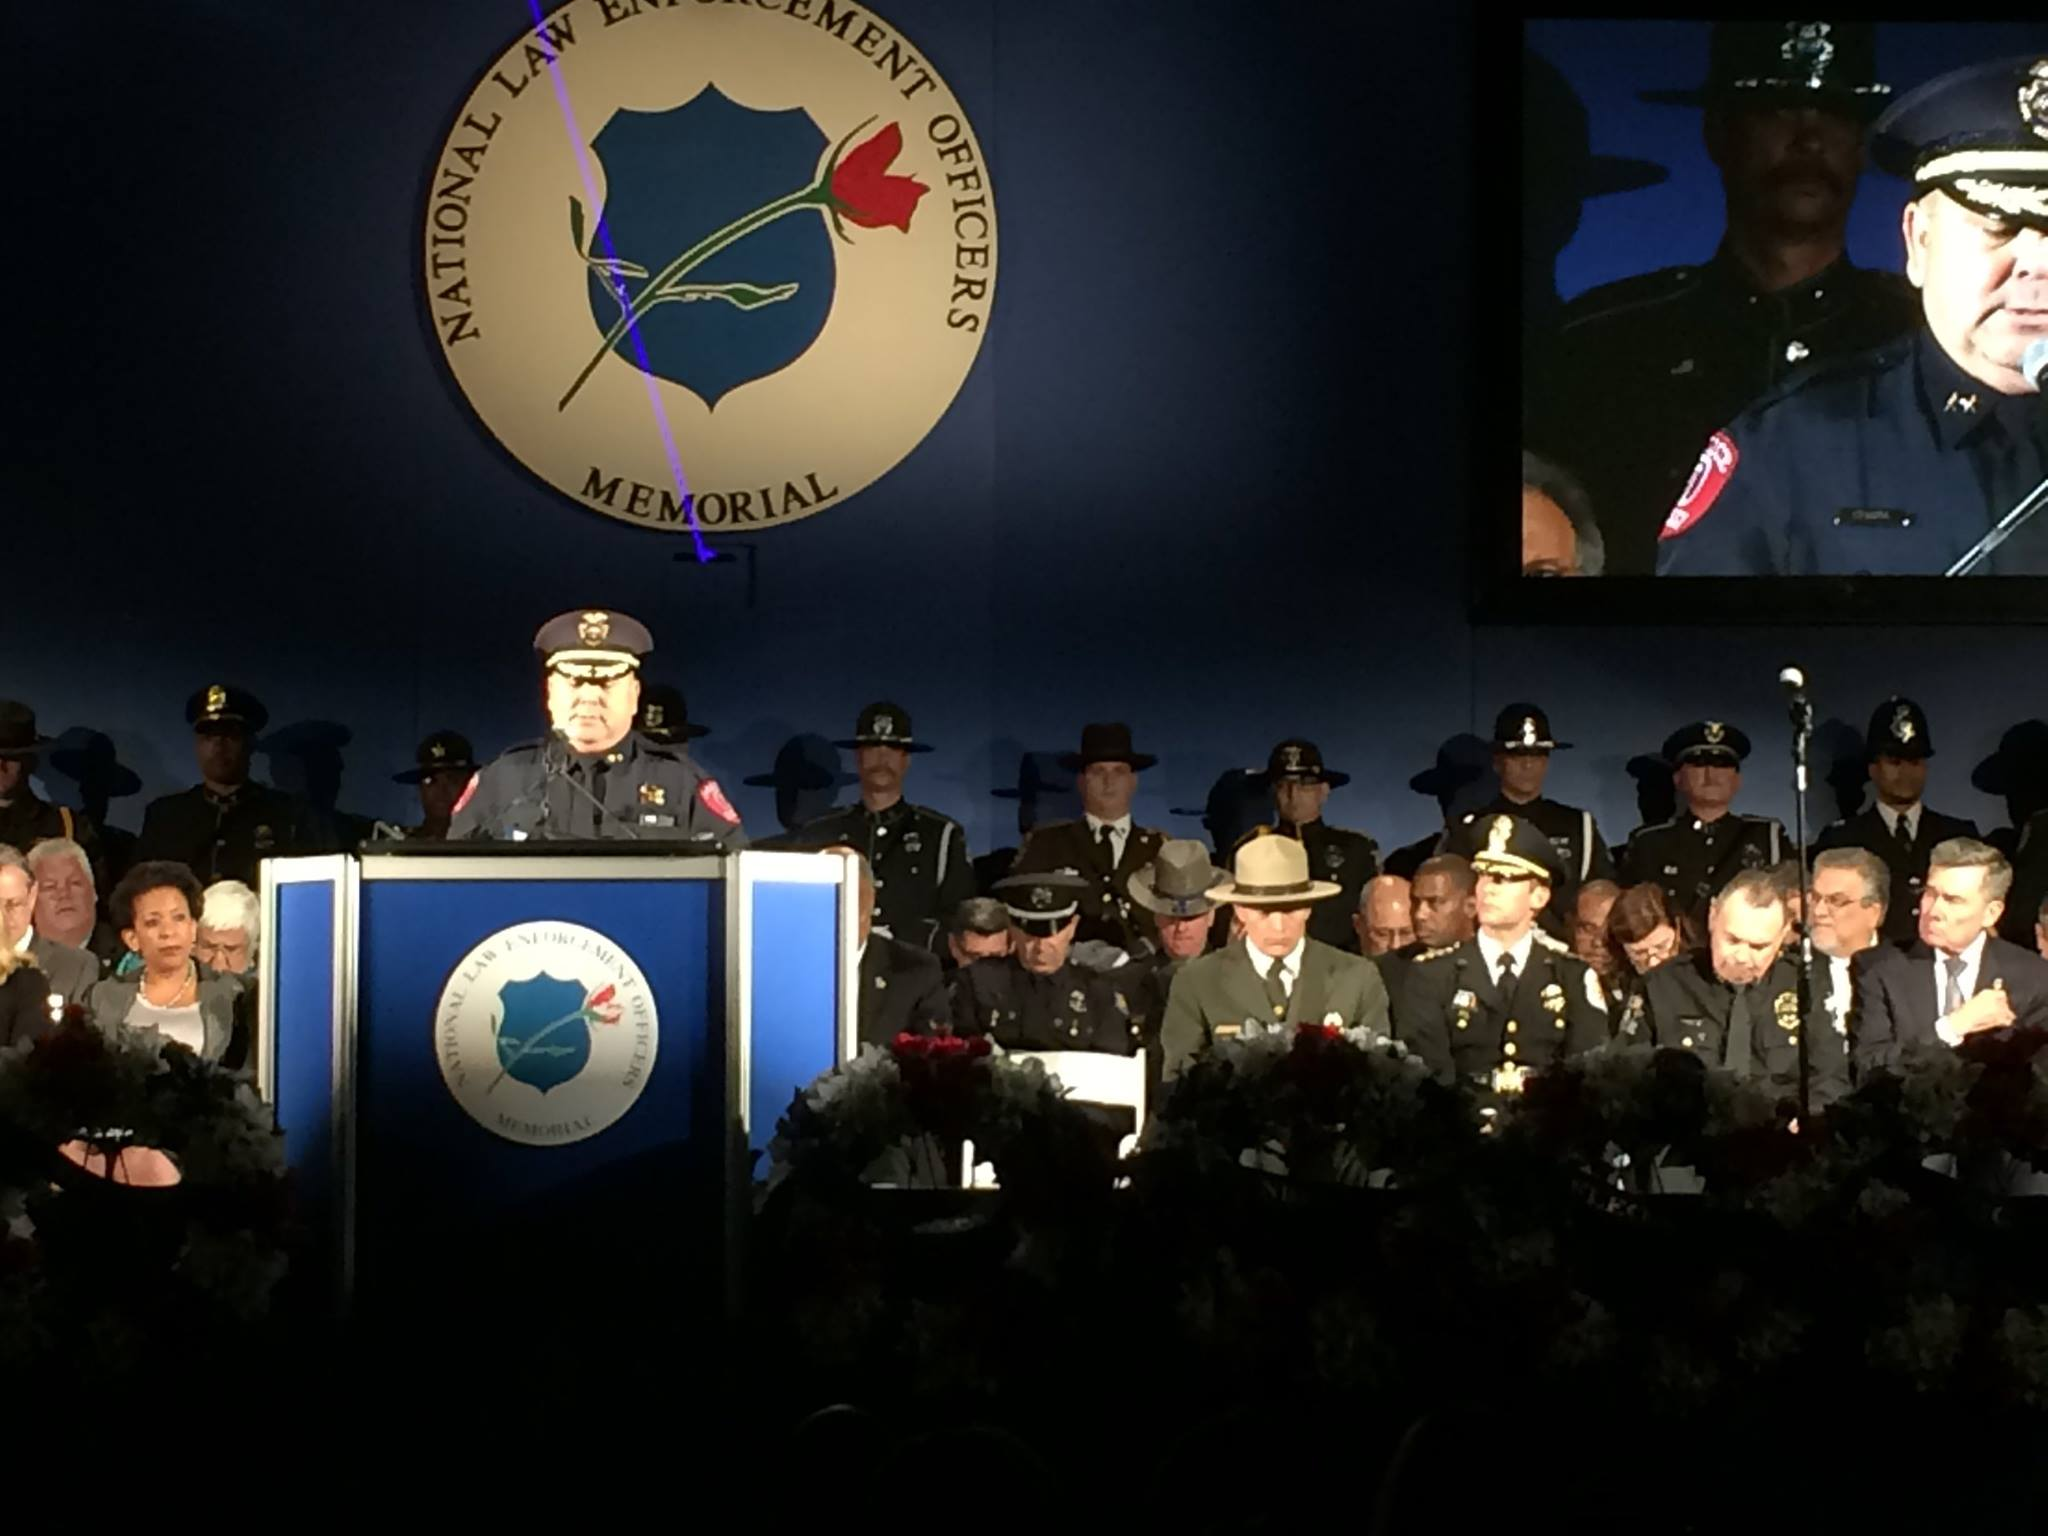 Honoring Officer Kelley